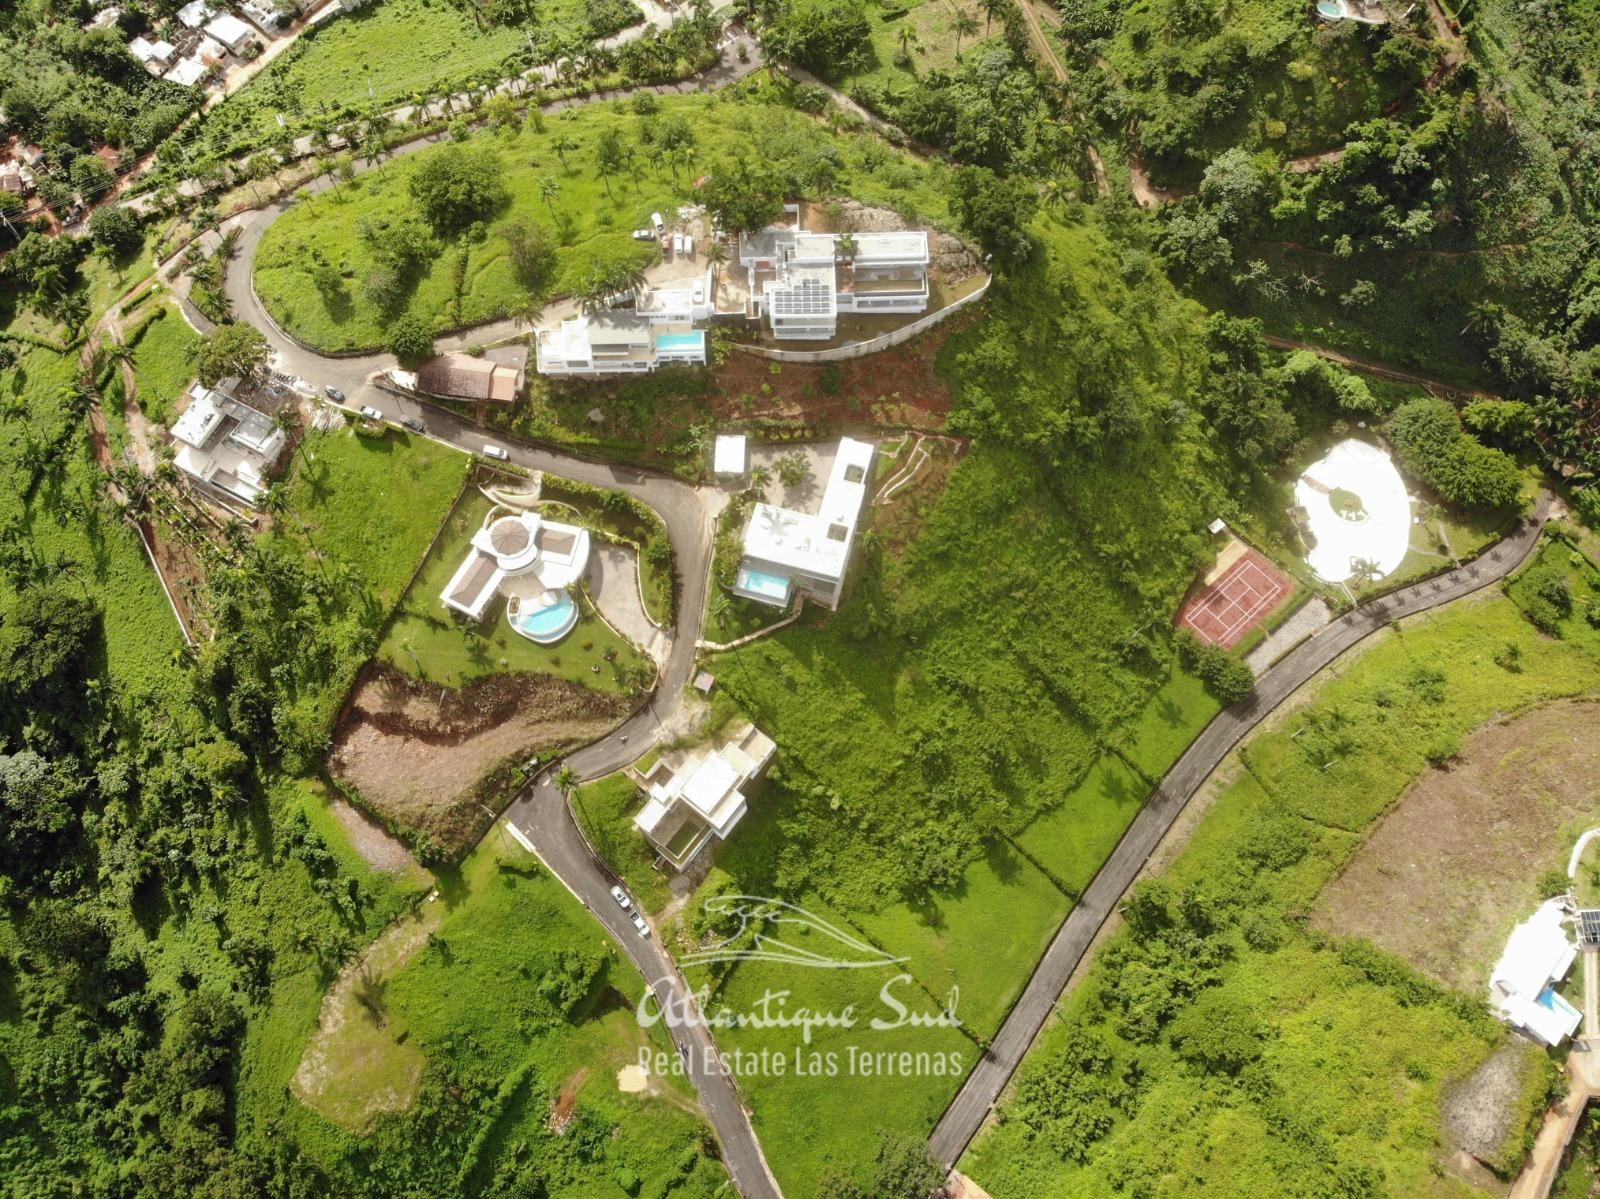 Hillside Lots for sale in Las Terrenas11.jpeg